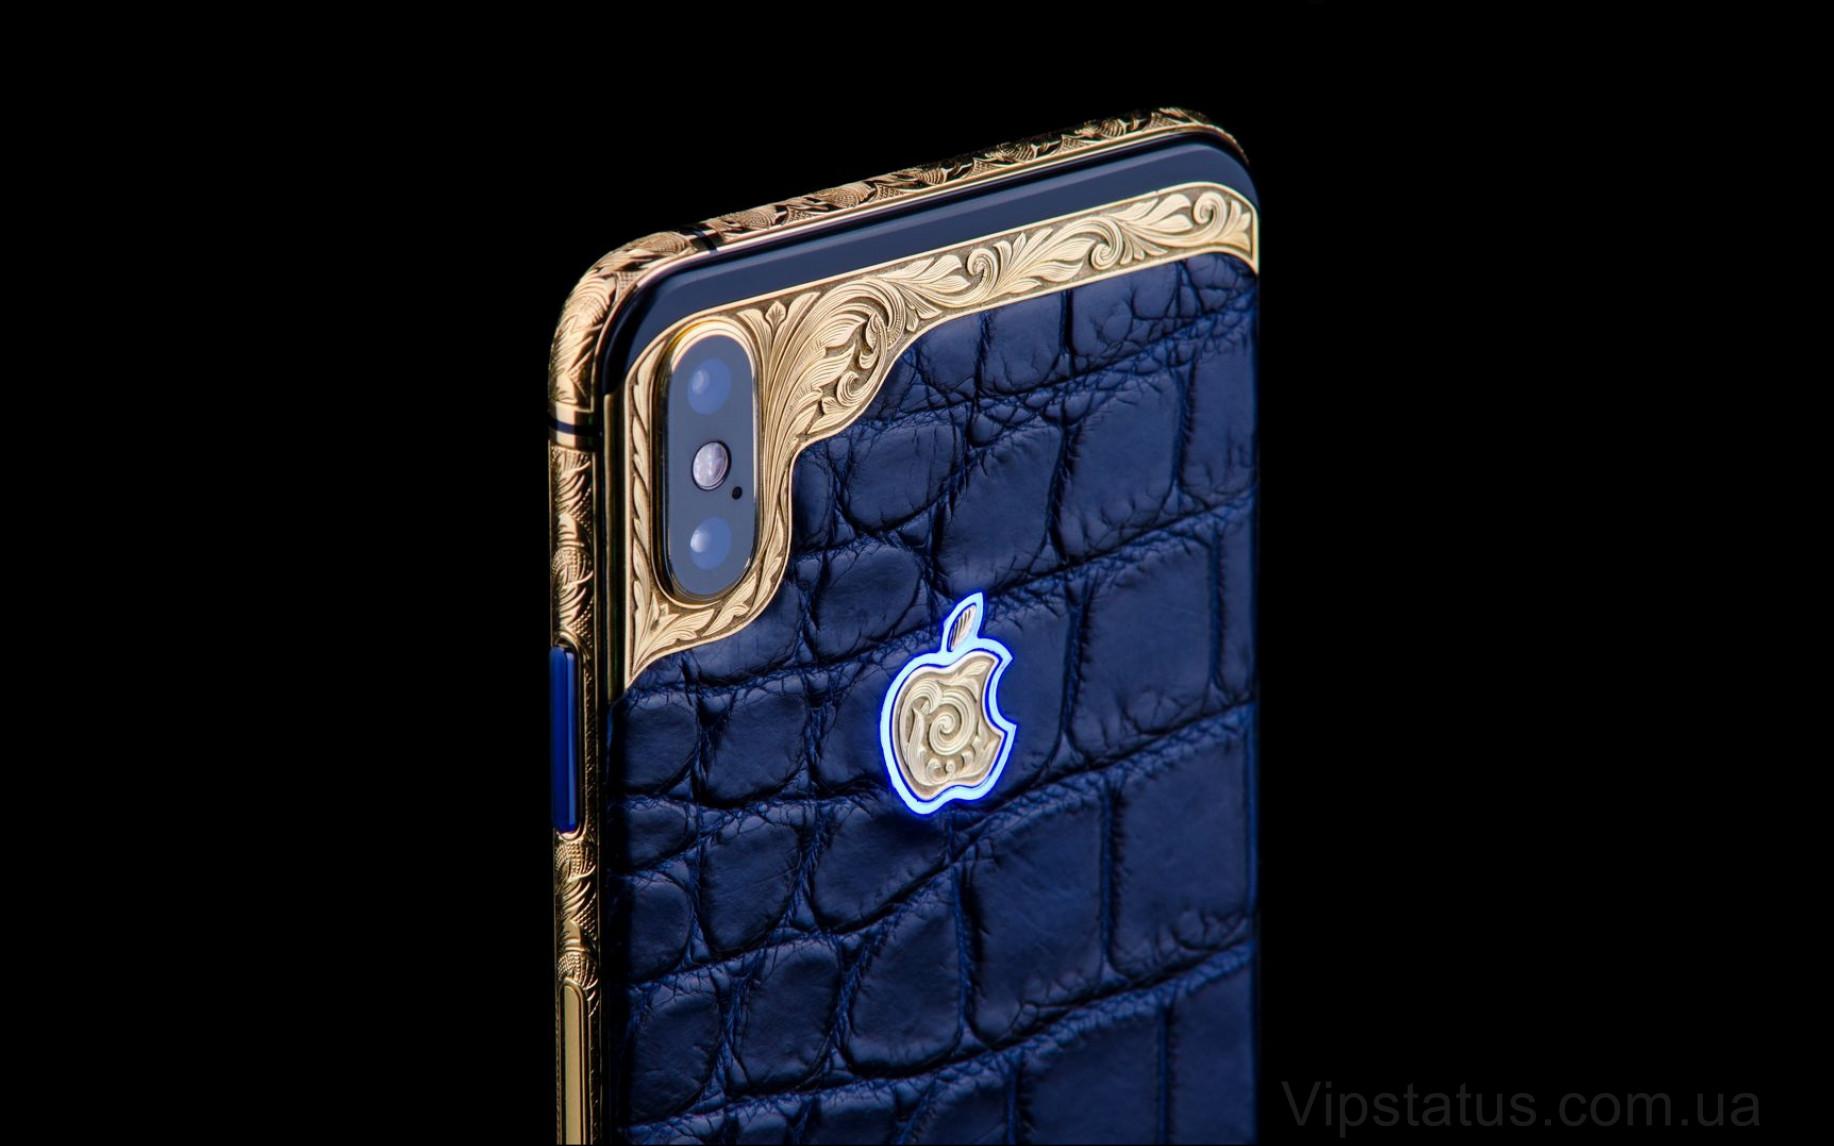 Elite Sapphire Star IPHONE XS 512 GB Sapphire Star IPHONE XS 512 GB image 2